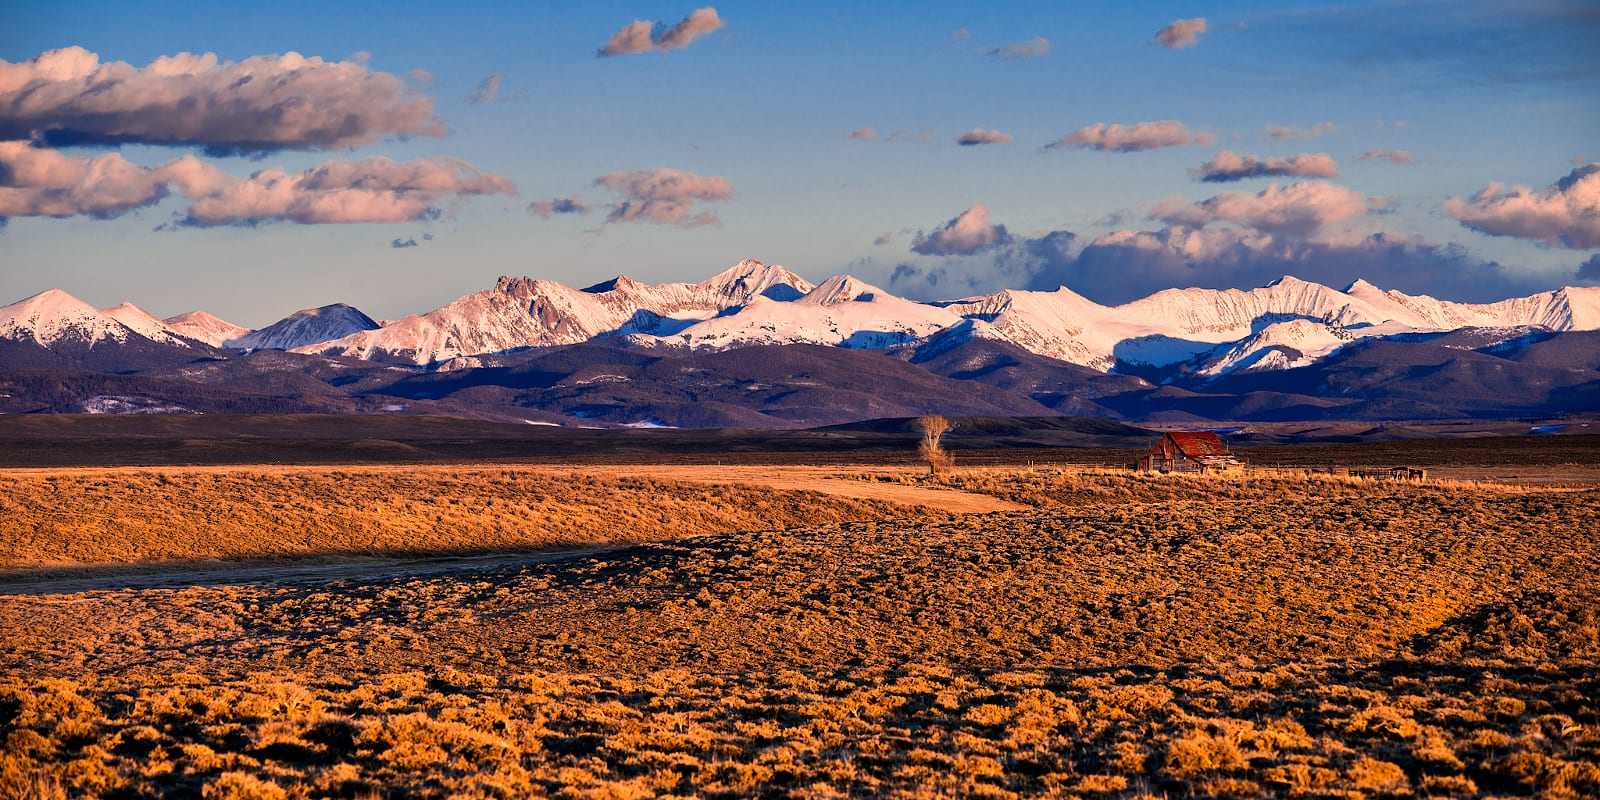 North Park Colorado Never Summer Mountain Range from Arapaho National Wildlife Refuge